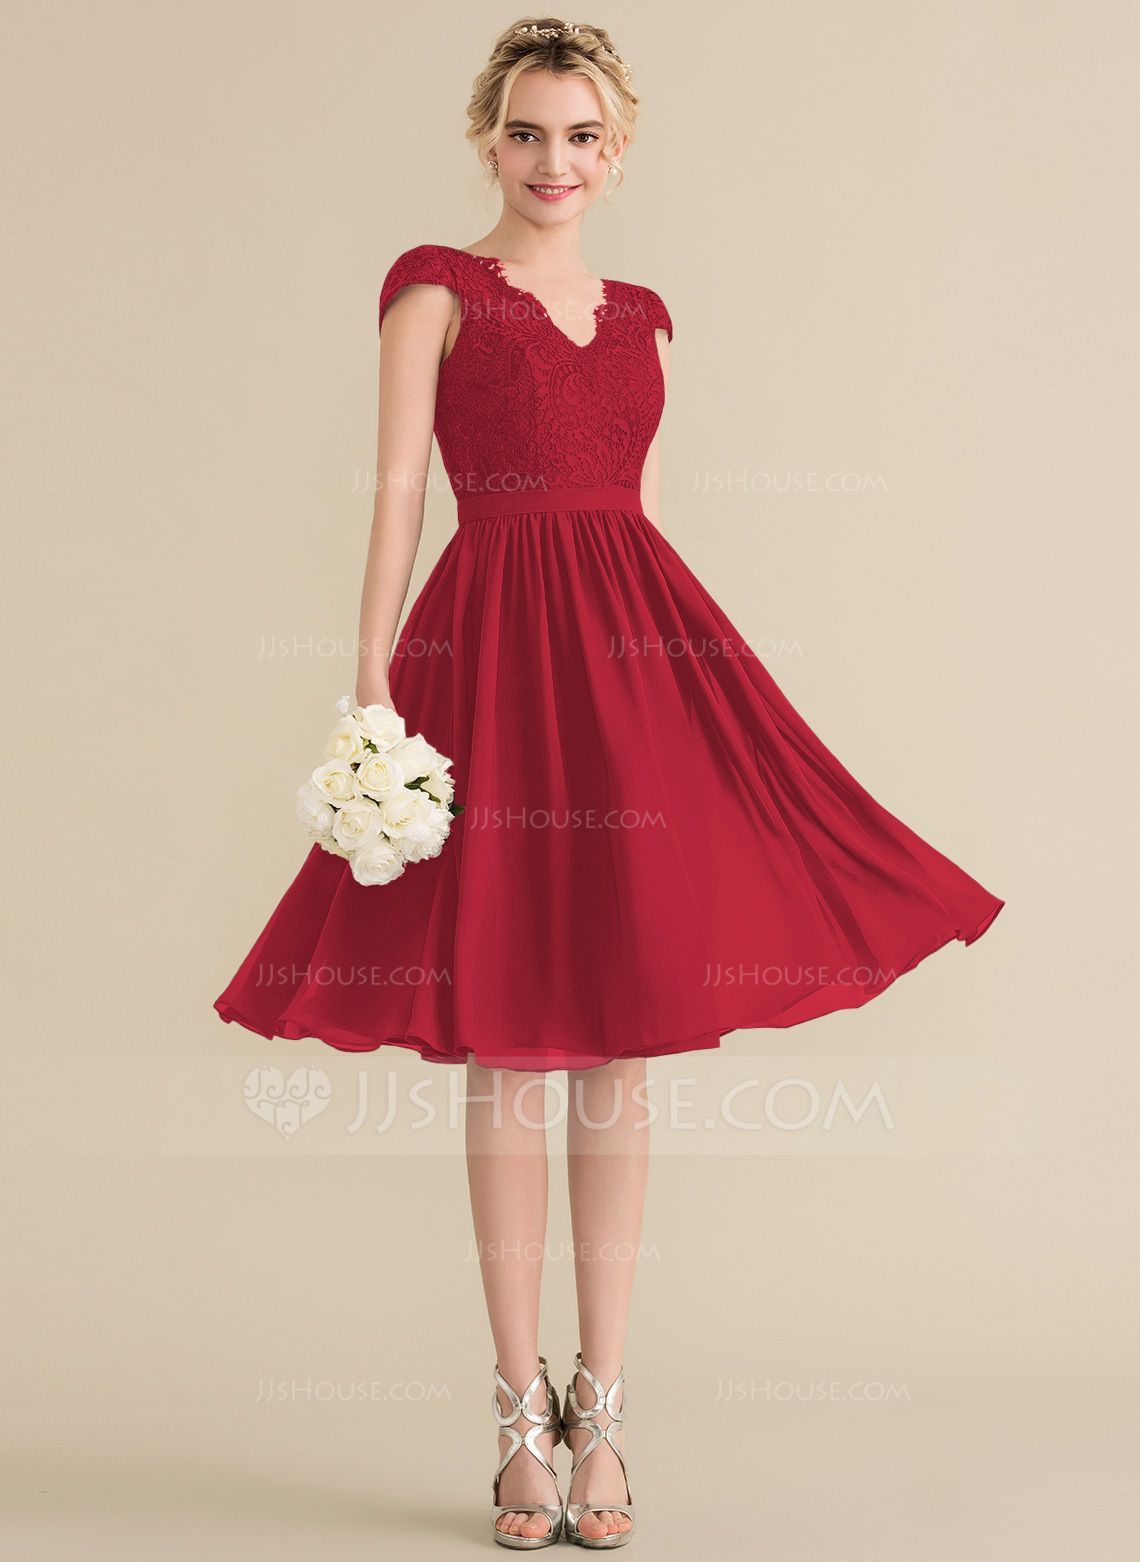 a57203a705de9 A-Line/Princess V-neck Knee-Length Chiffon Lace Bridesmaid Dress  (007144774) - Bridesmaid Dresses - JJsHouse